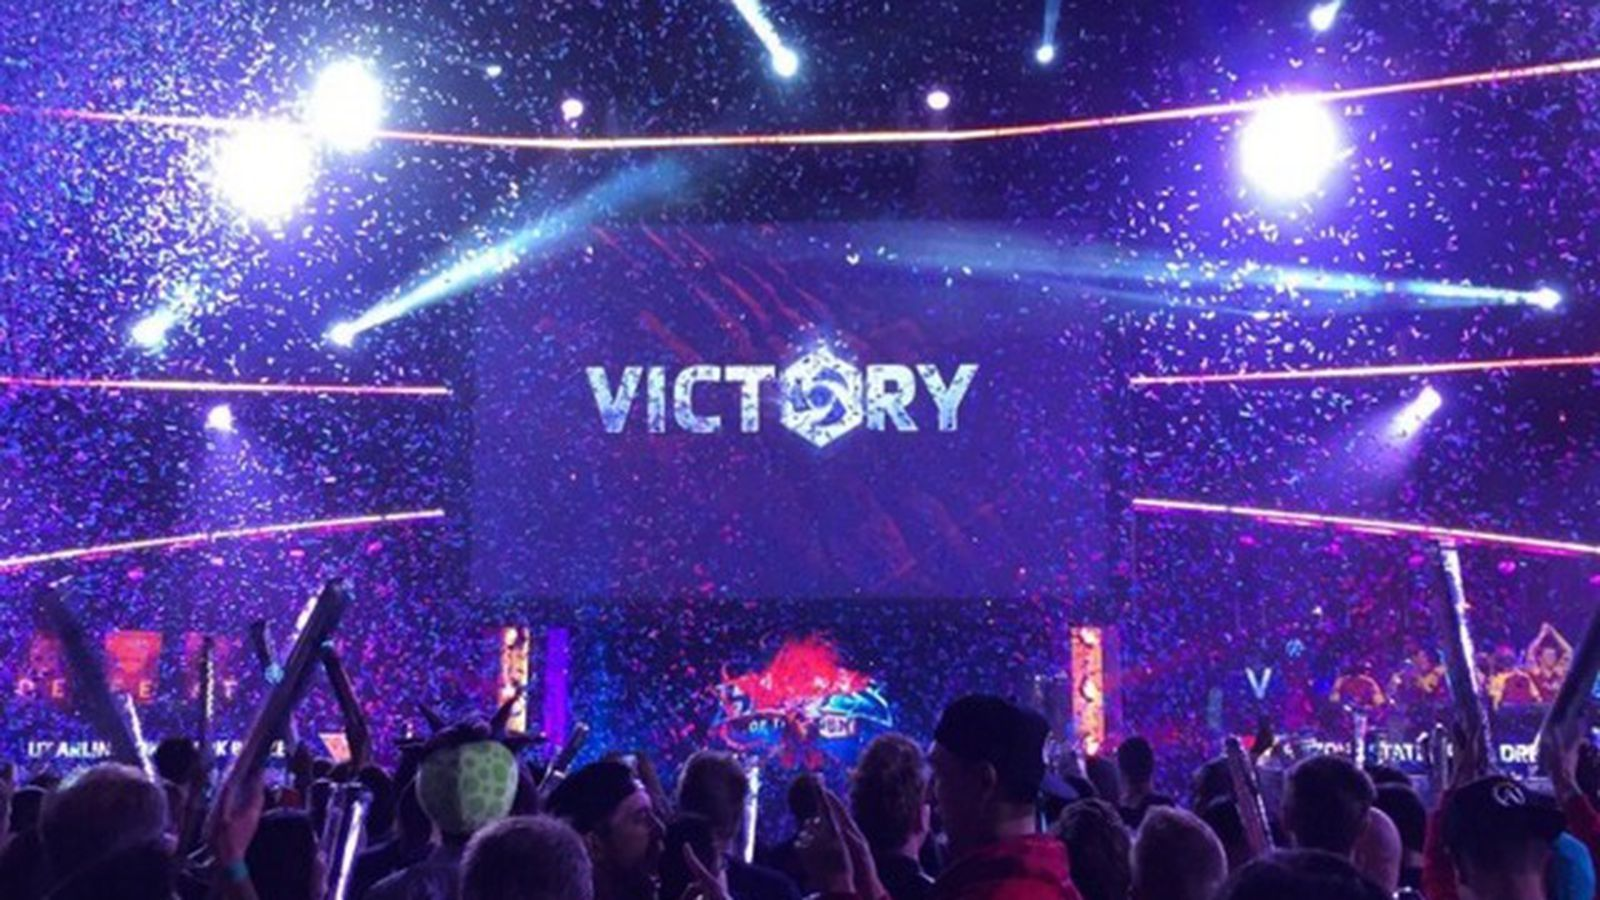 Victory.0.0